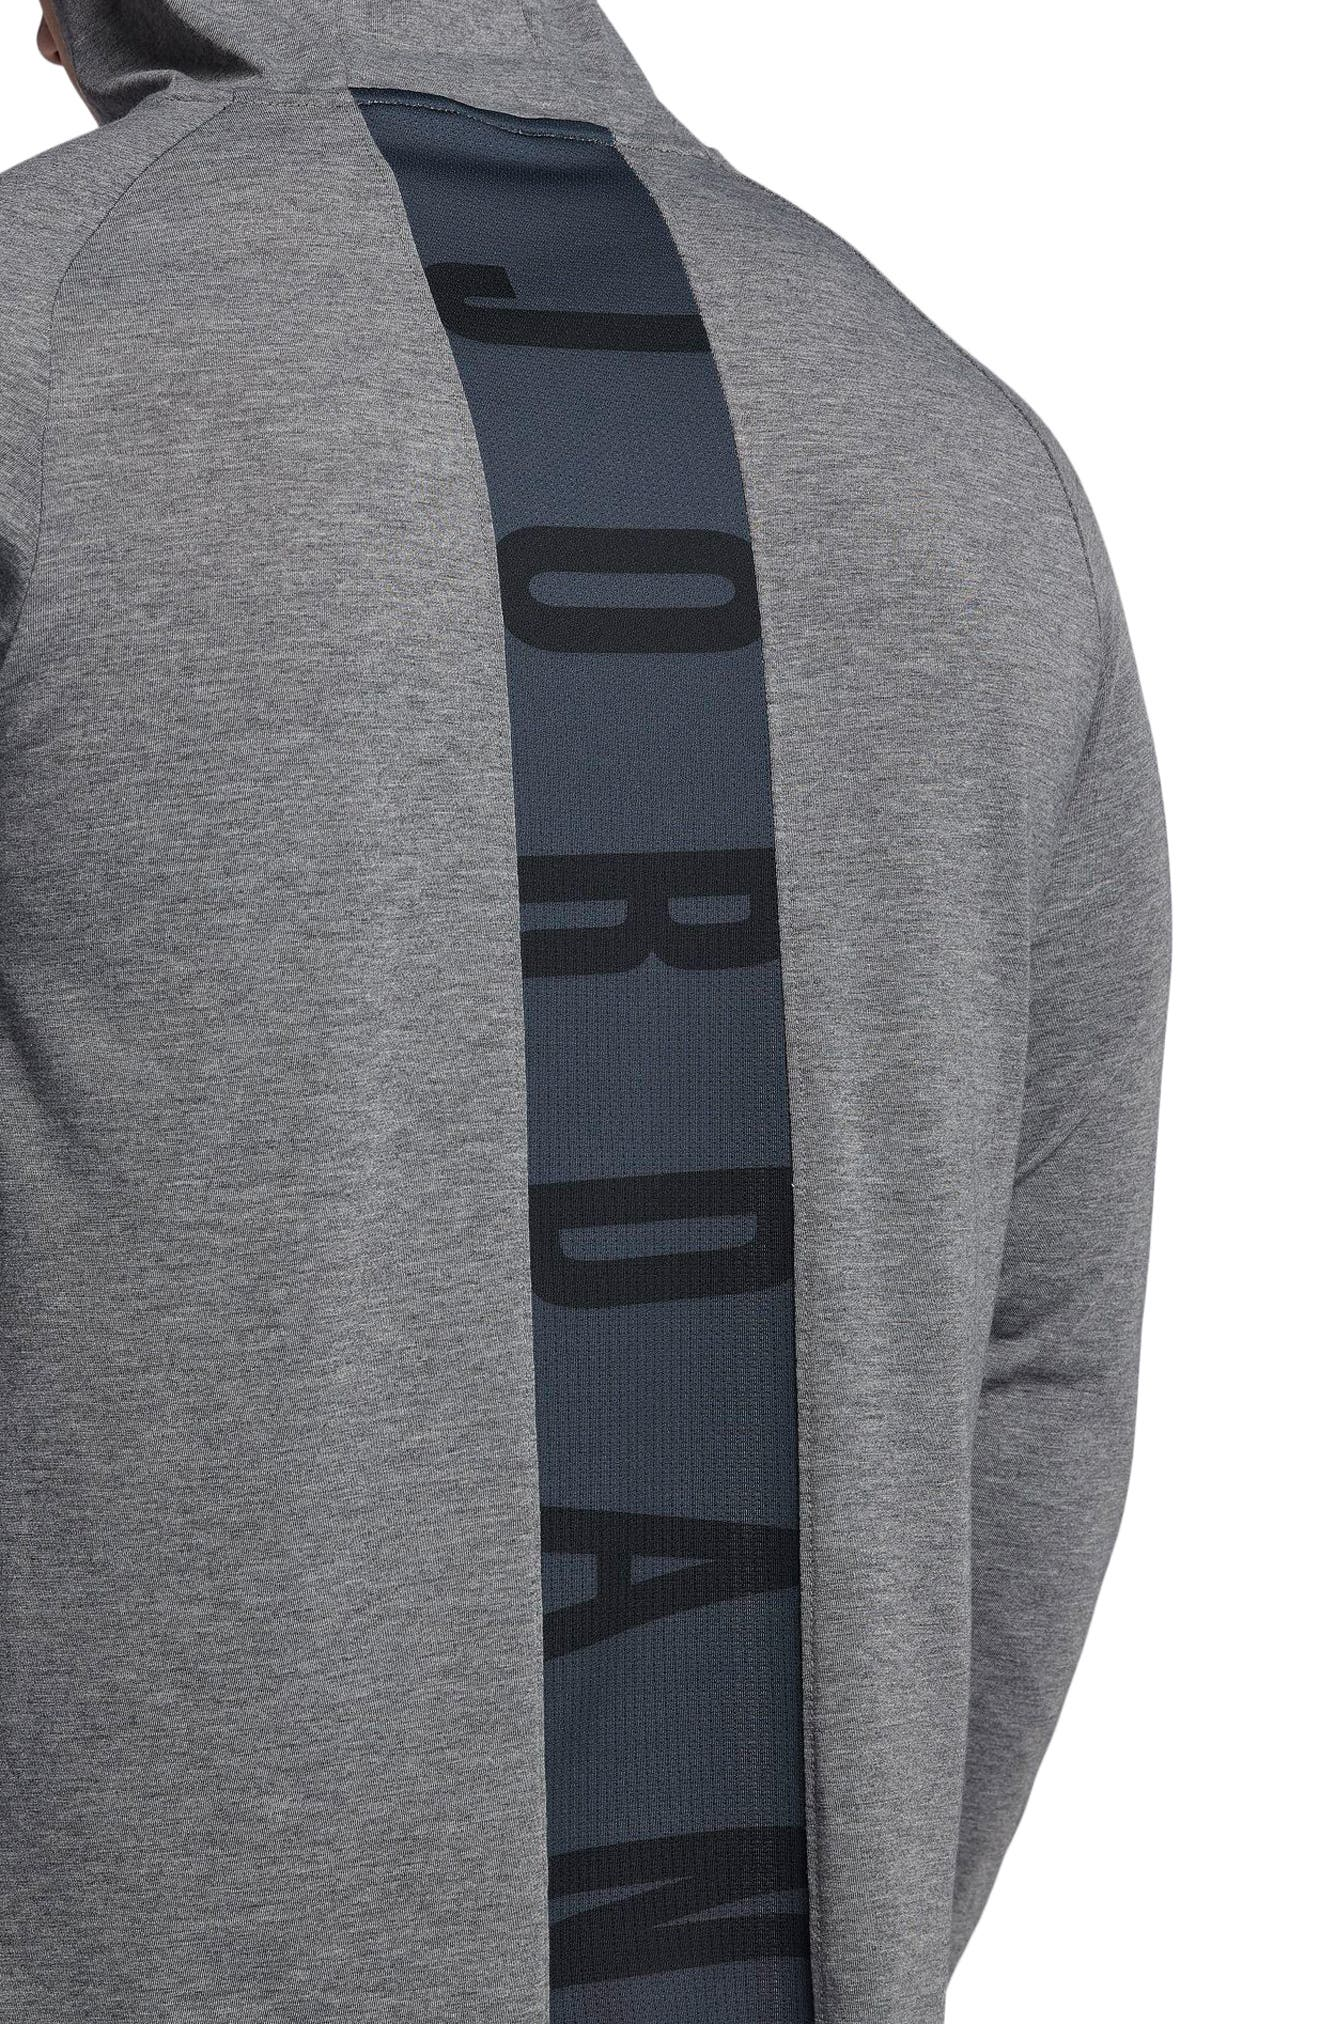 Nike Dry 23 Alpha Hooded Shirt,                             Alternate thumbnail 3, color,                             Carbon Heather/ Black